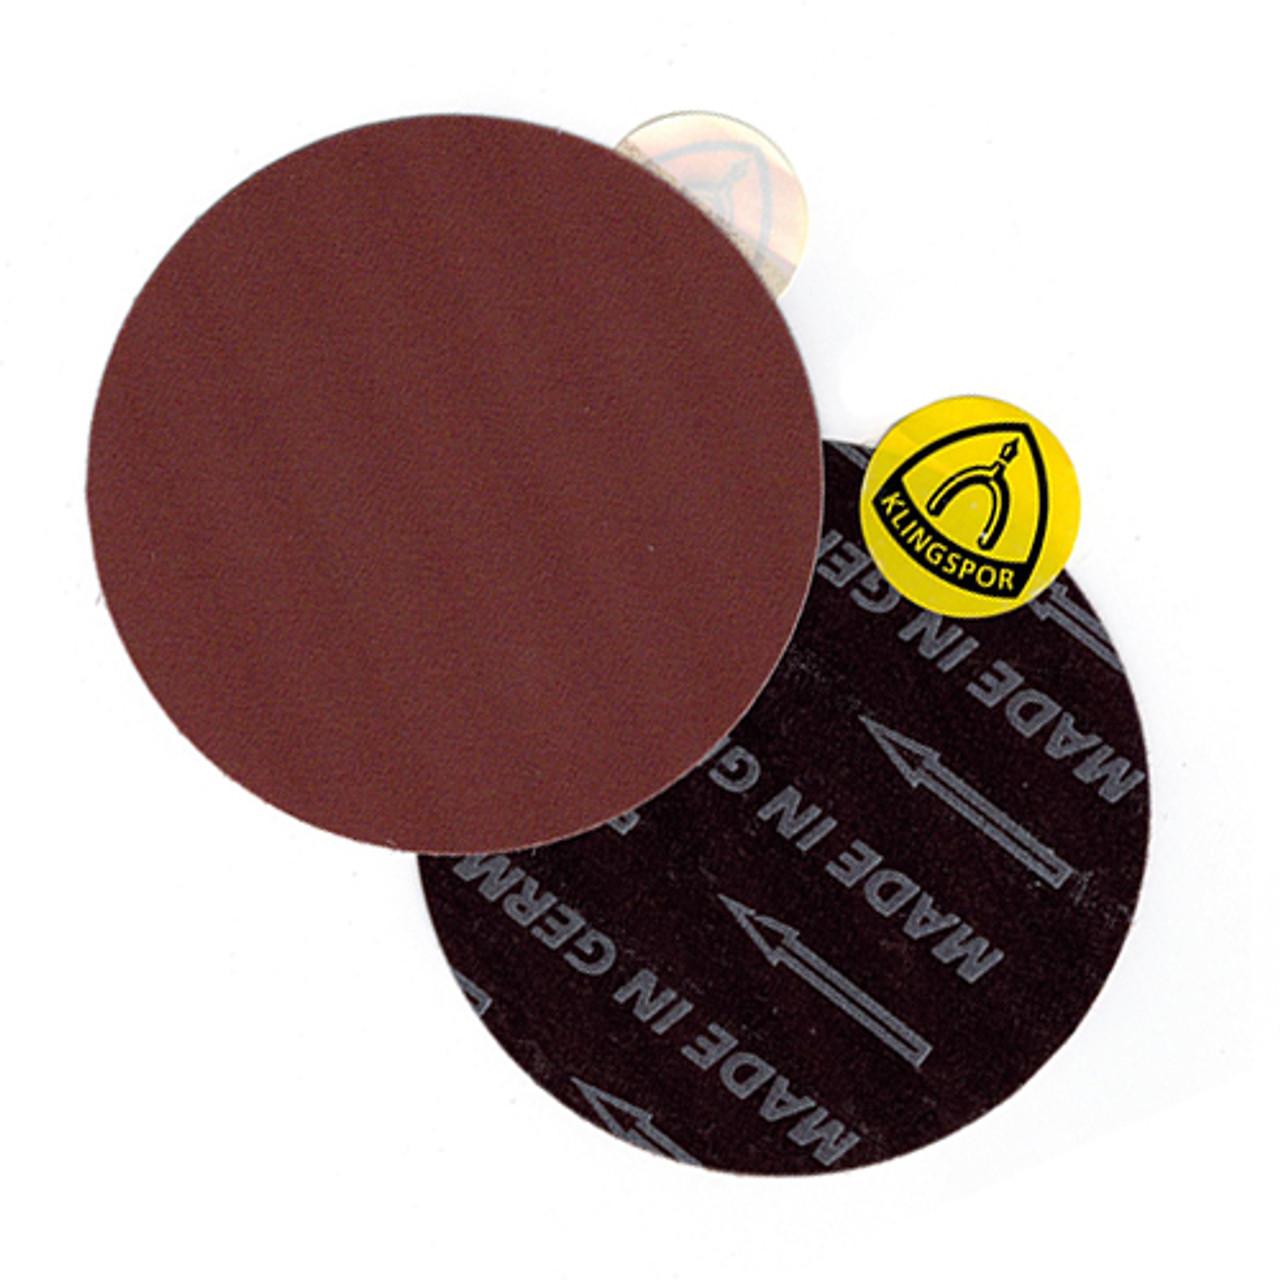 "Klingspor Abrasives 6"" No Hole, Cloth Backed, Pressure Sensitive Adhesive, 220 Grit Discs, 5pk"